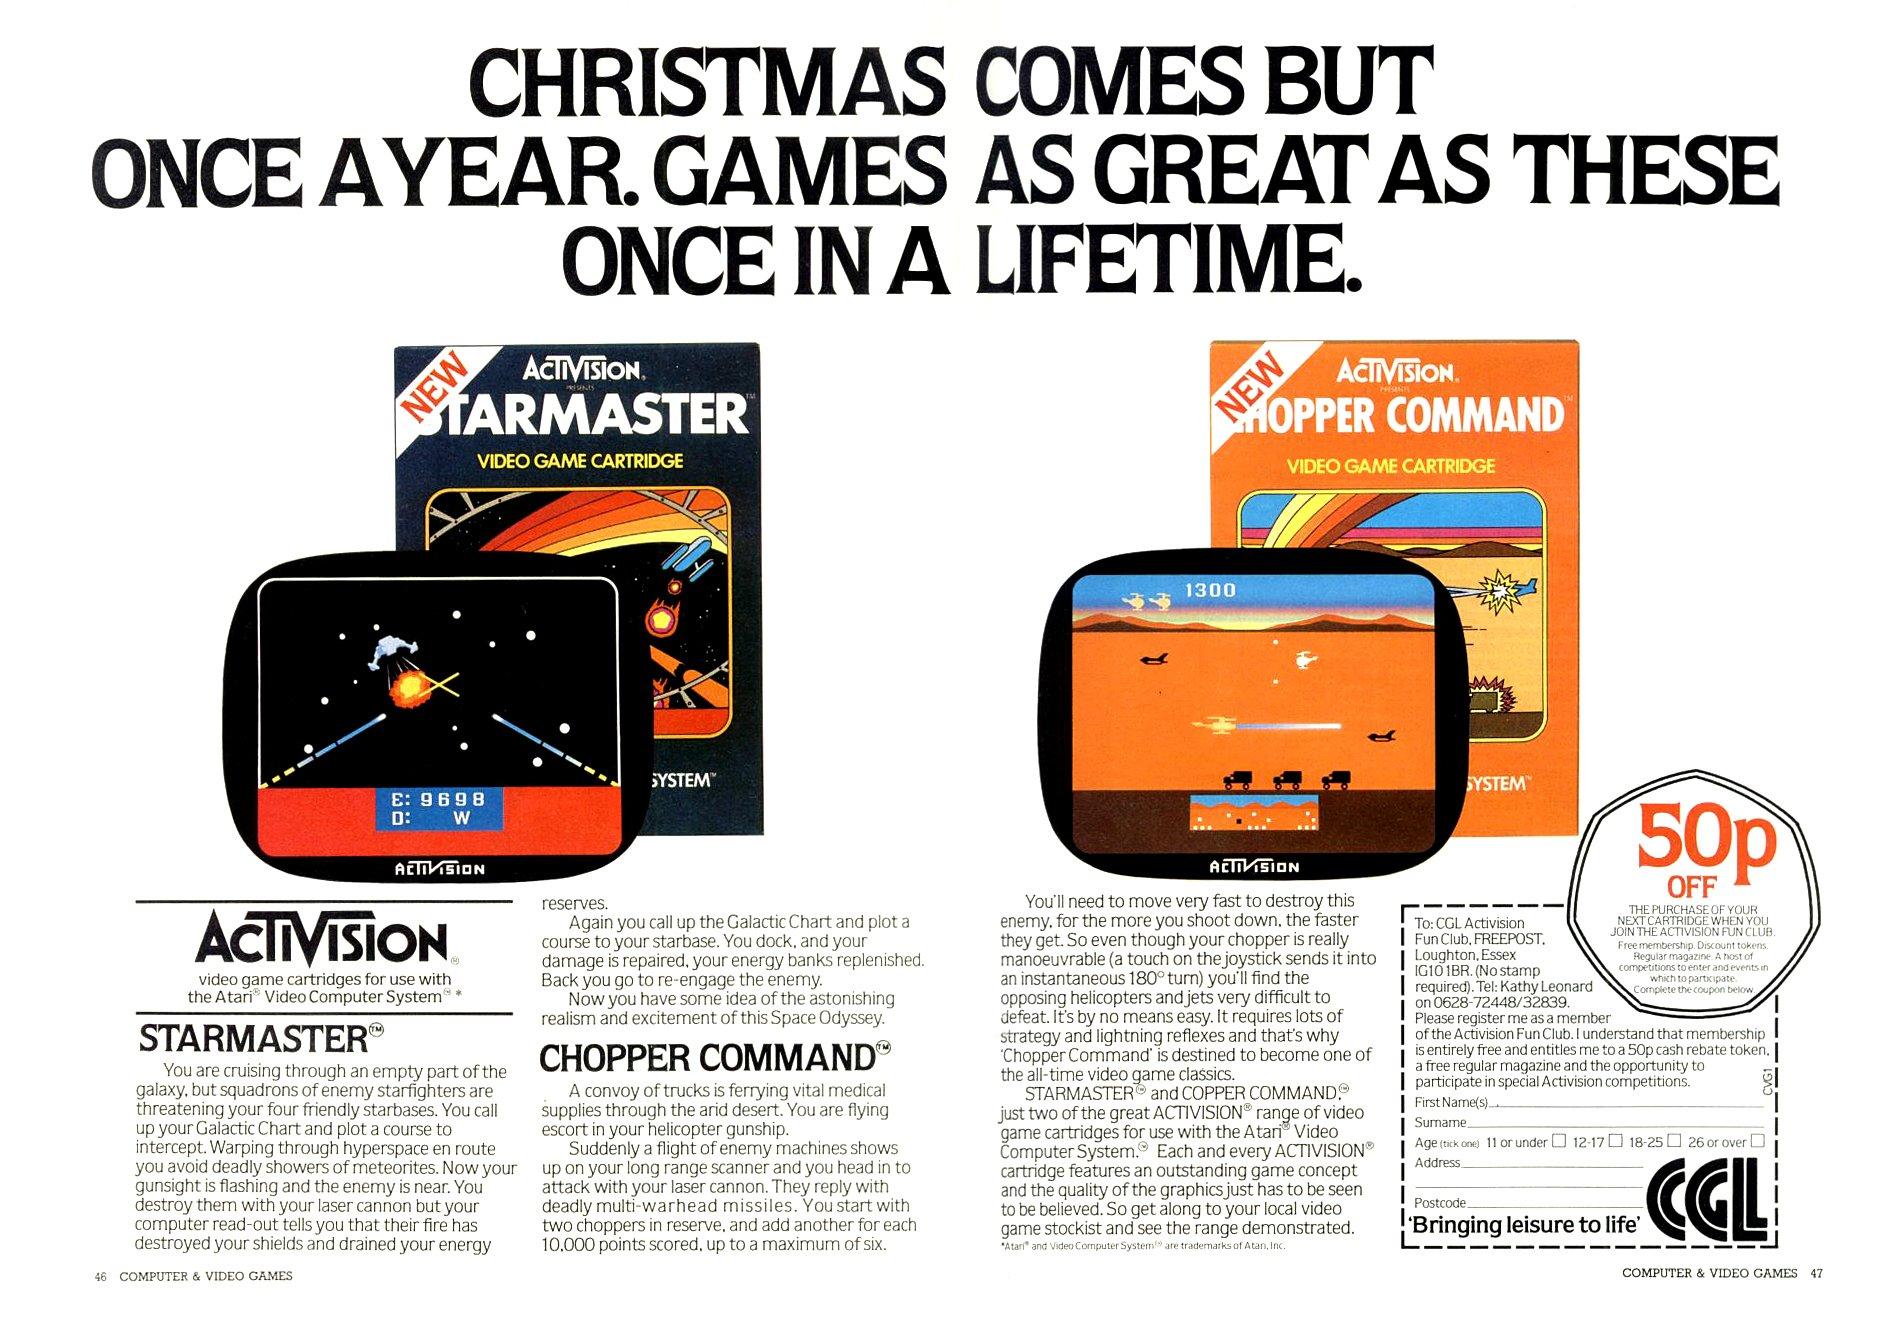 Starmaster, Chopper Command